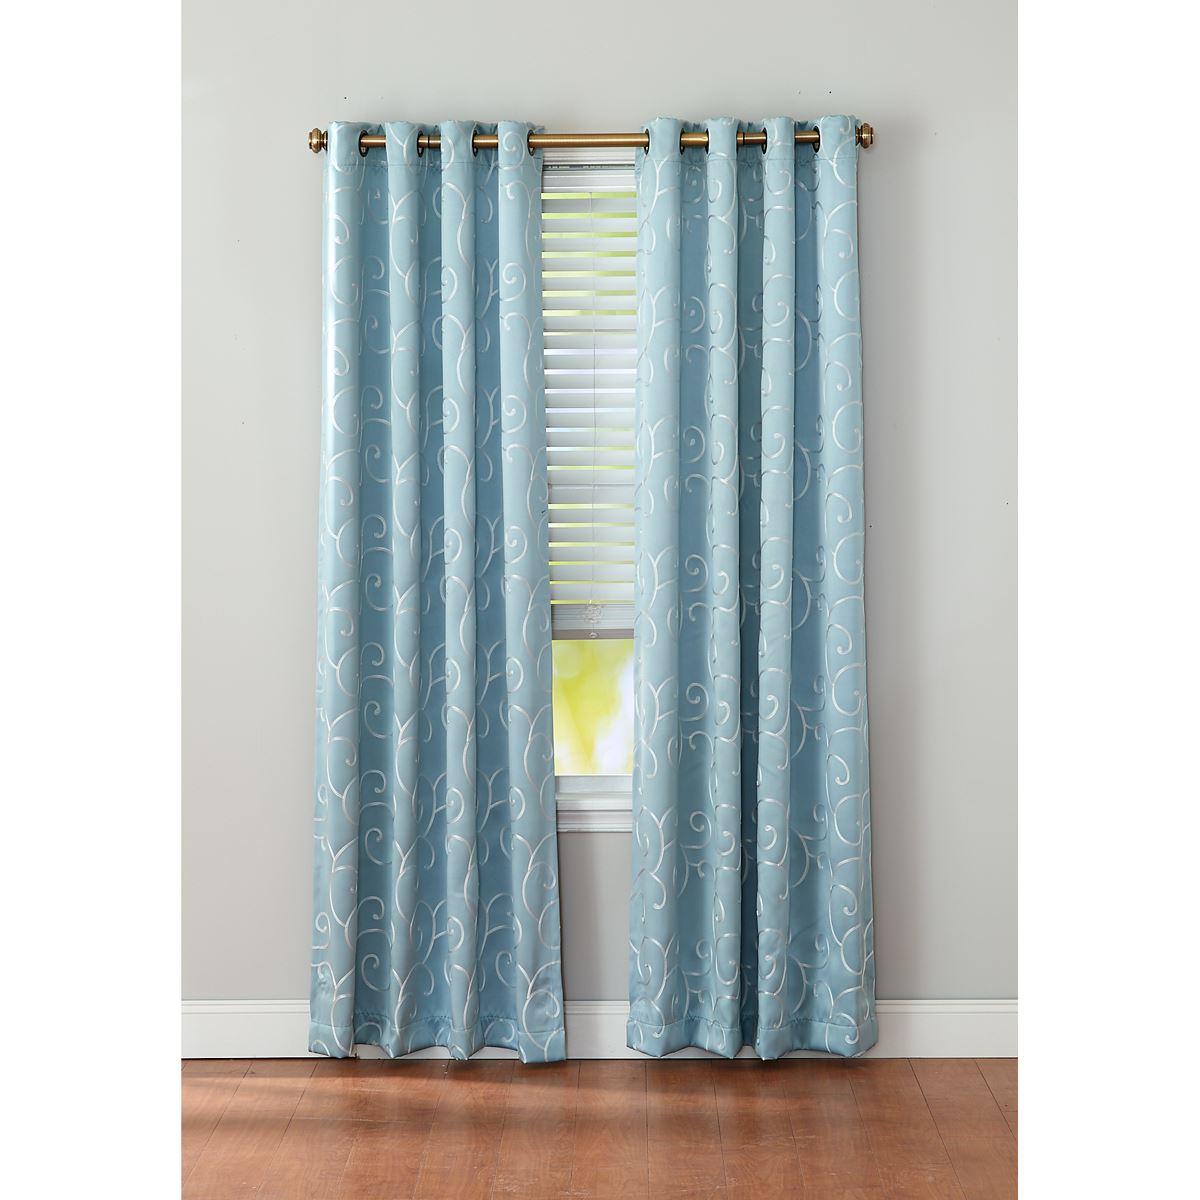 Merrit Blackout Grommet Curtain Panel Pertaining To Blackout Grommet Curtain Panels (View 14 of 20)